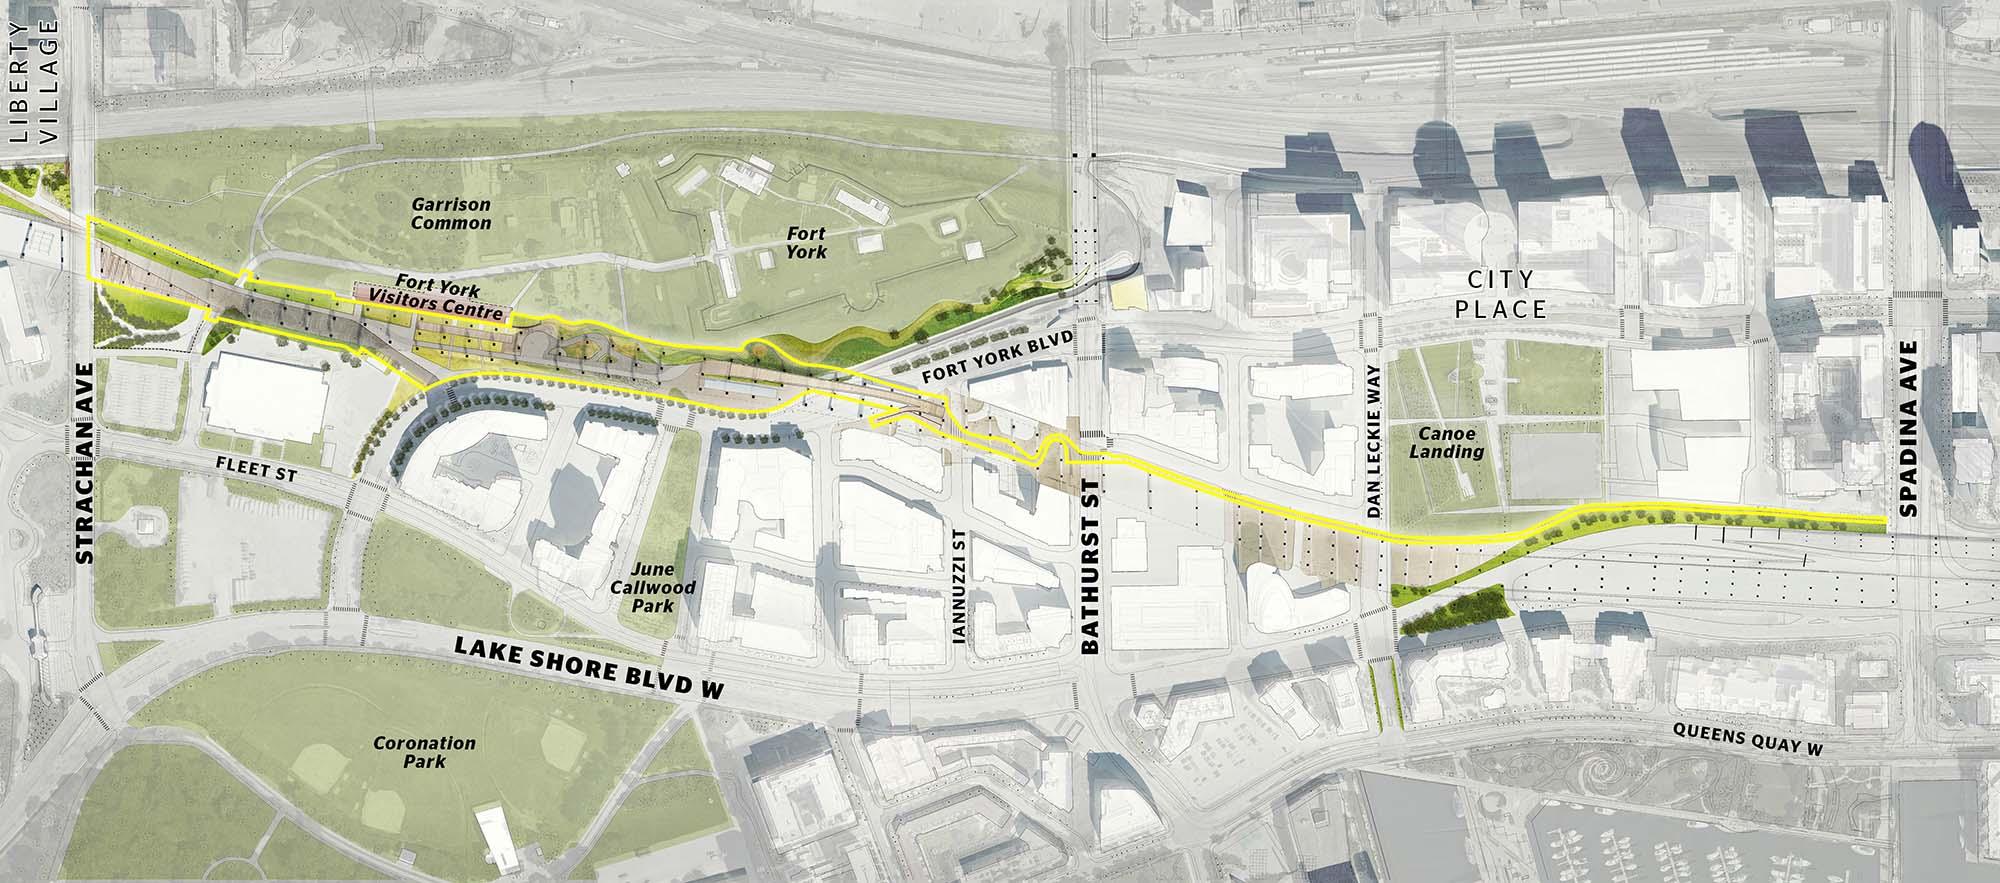 Bentway Site Plan - Map